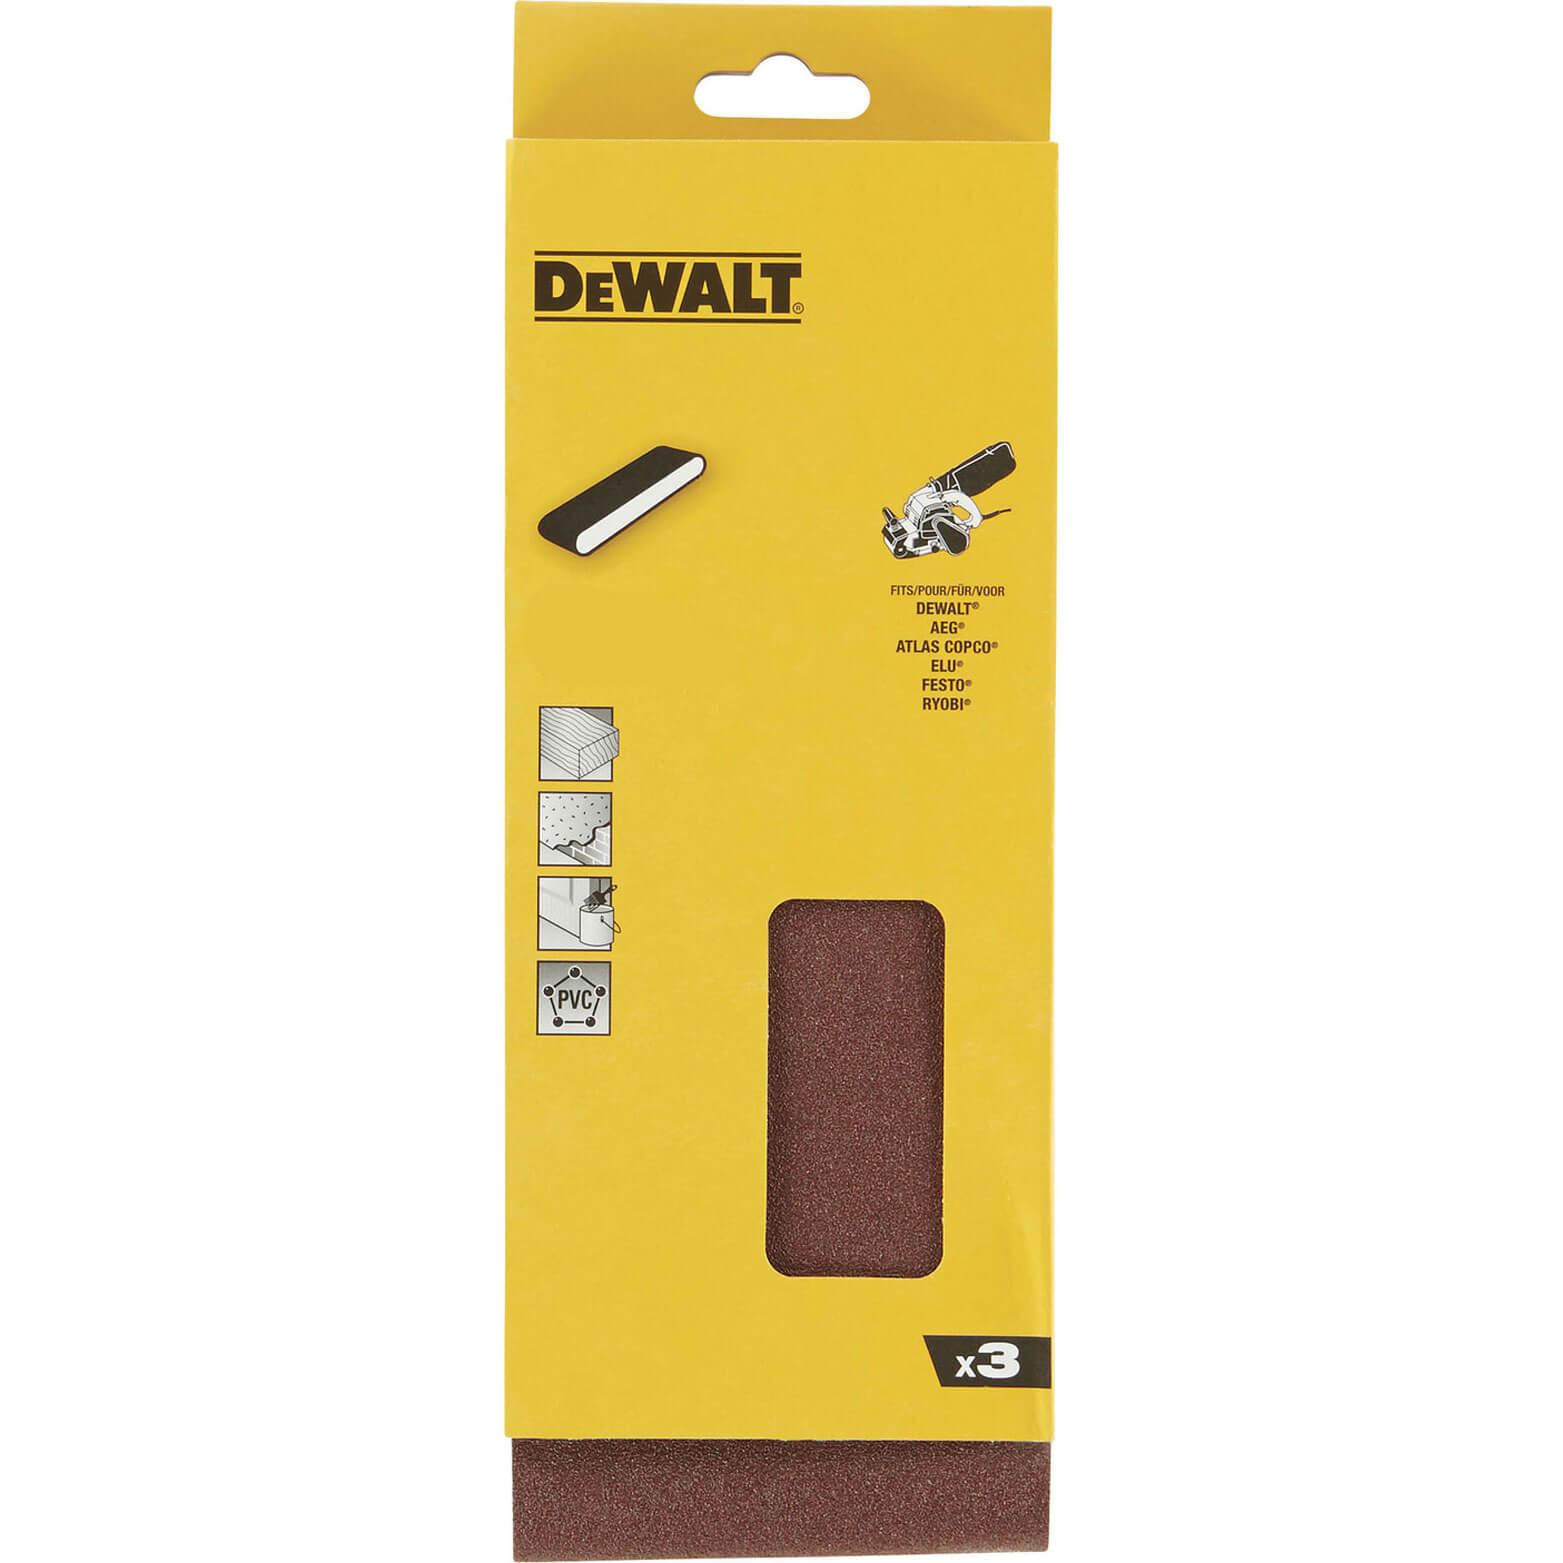 Image of DeWalt 100 x 560mm Multi Purpose Sanding Belts 100mm x 560mm 150g Pack of 3